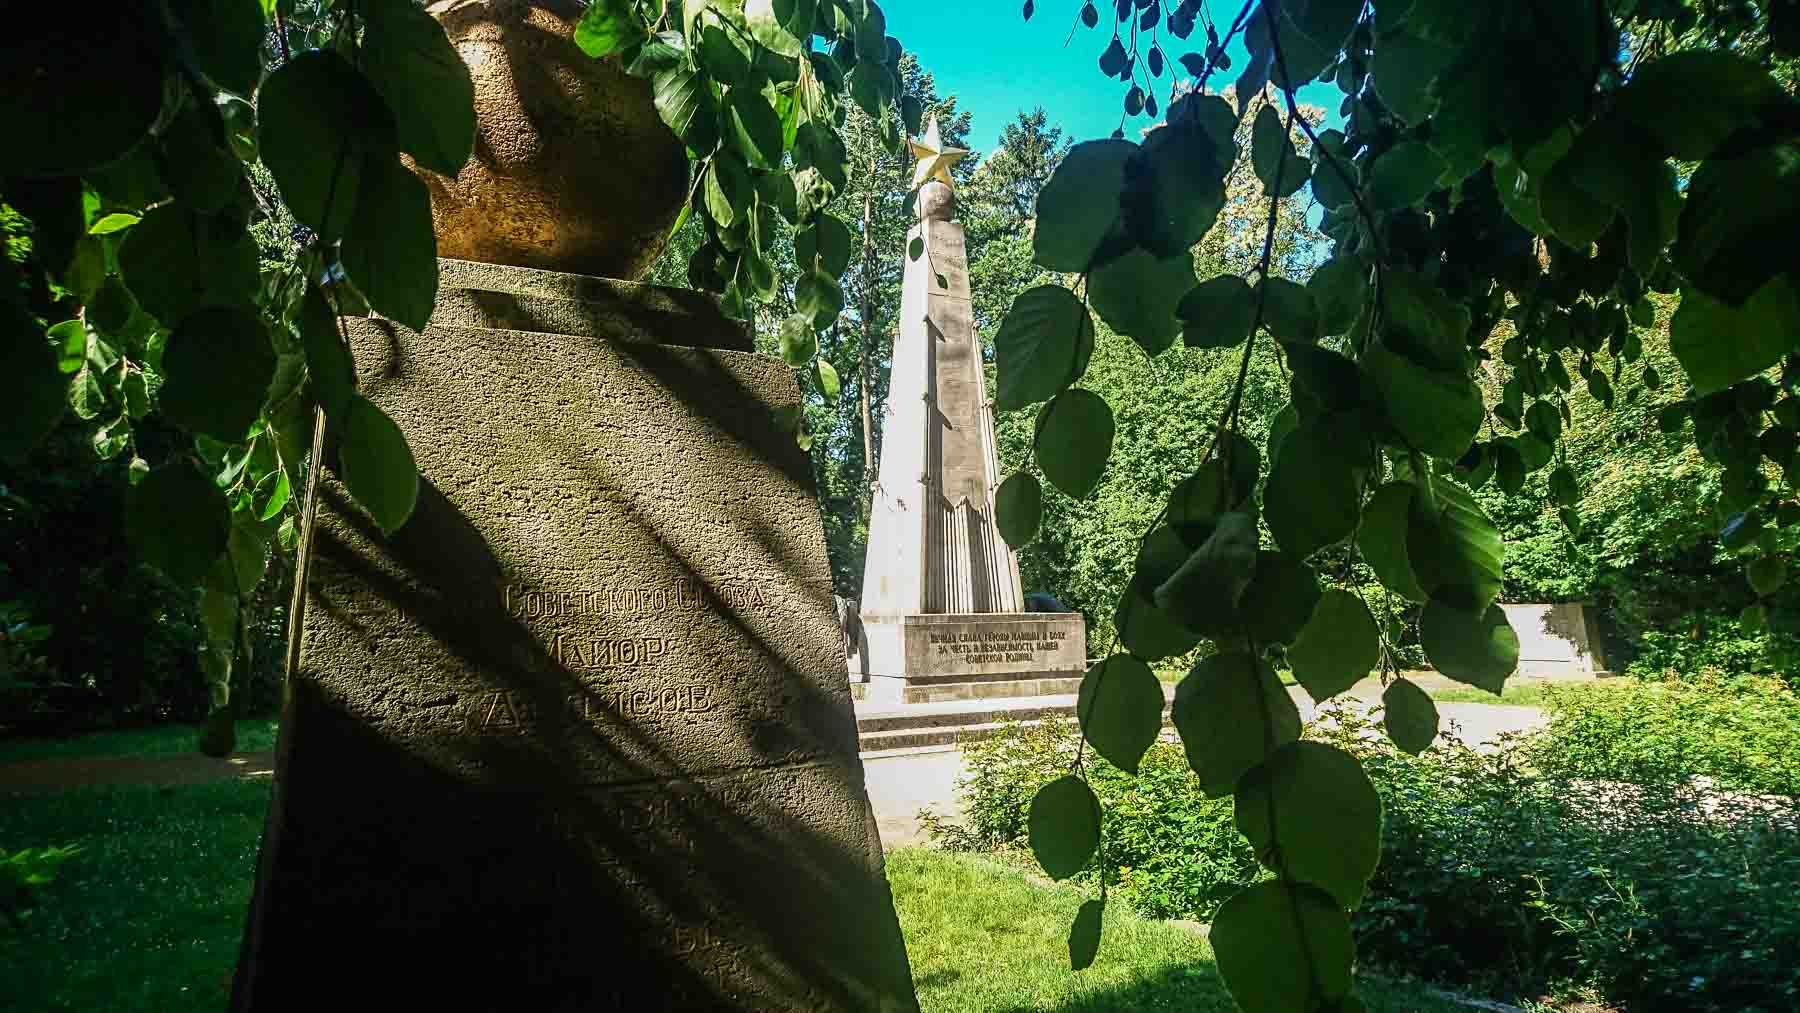 Sowjetischer Ehrenfriedhof Bernau bei Berlin